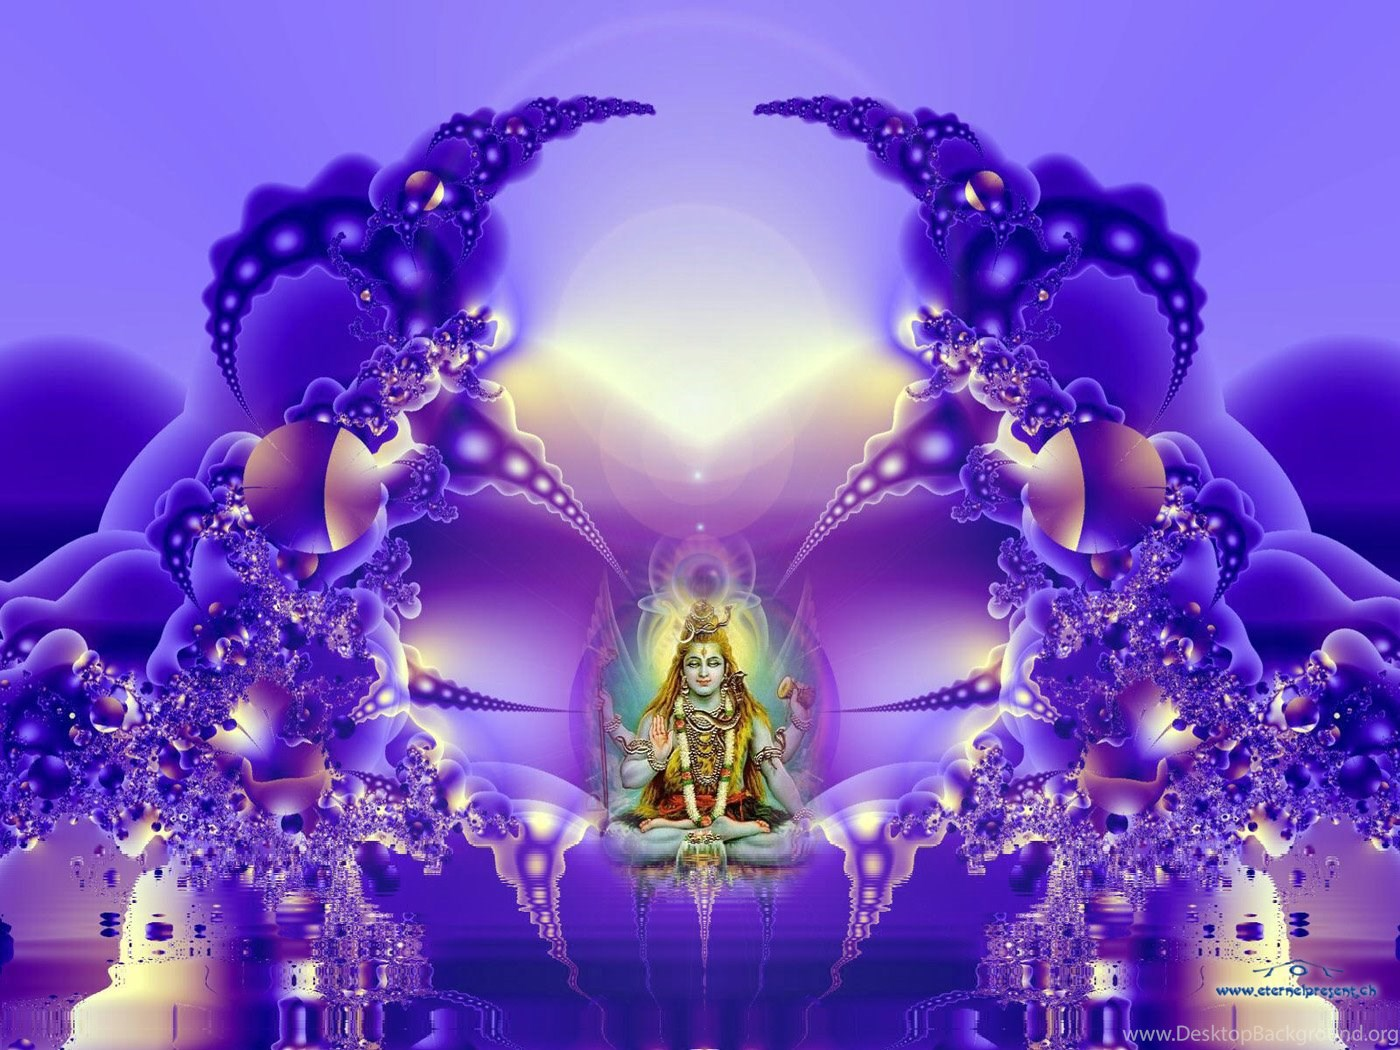 Hindu god wallpapers hd free download hd wallpapers and pictures hindu god hd wallpapers free download hd wallpapers pretty voltagebd Images